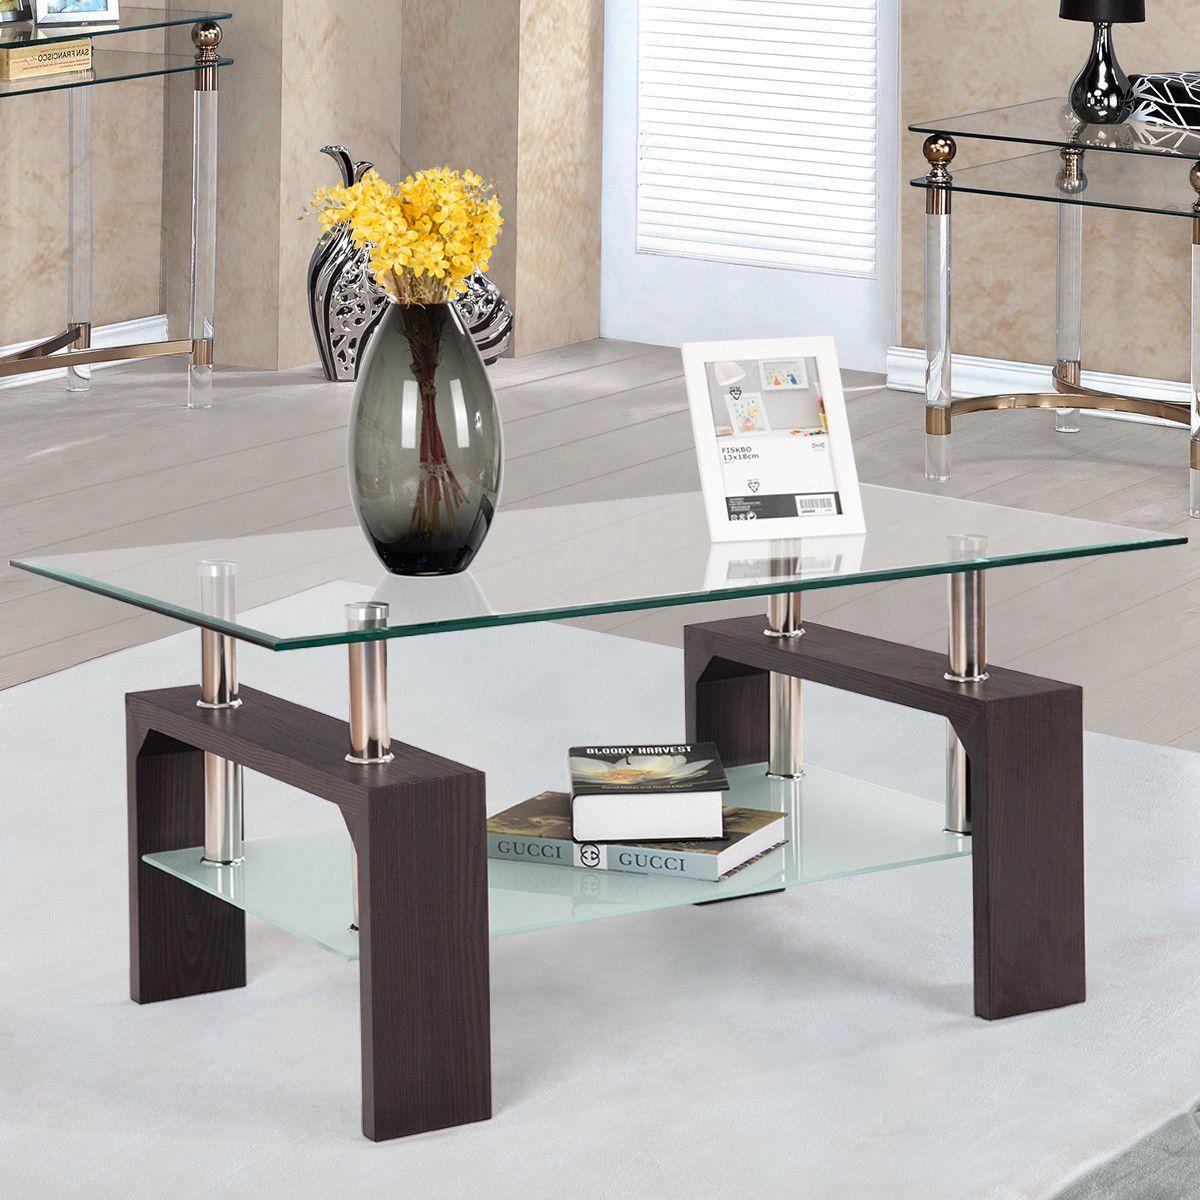 Costway Rectangular Tempered Glass Coffee Table W Shelf Wood Living Room Furniture Walmart Com In 2021 Coffee Table Living Room Wood Wood Furniture Living Room [ 1200 x 1200 Pixel ]